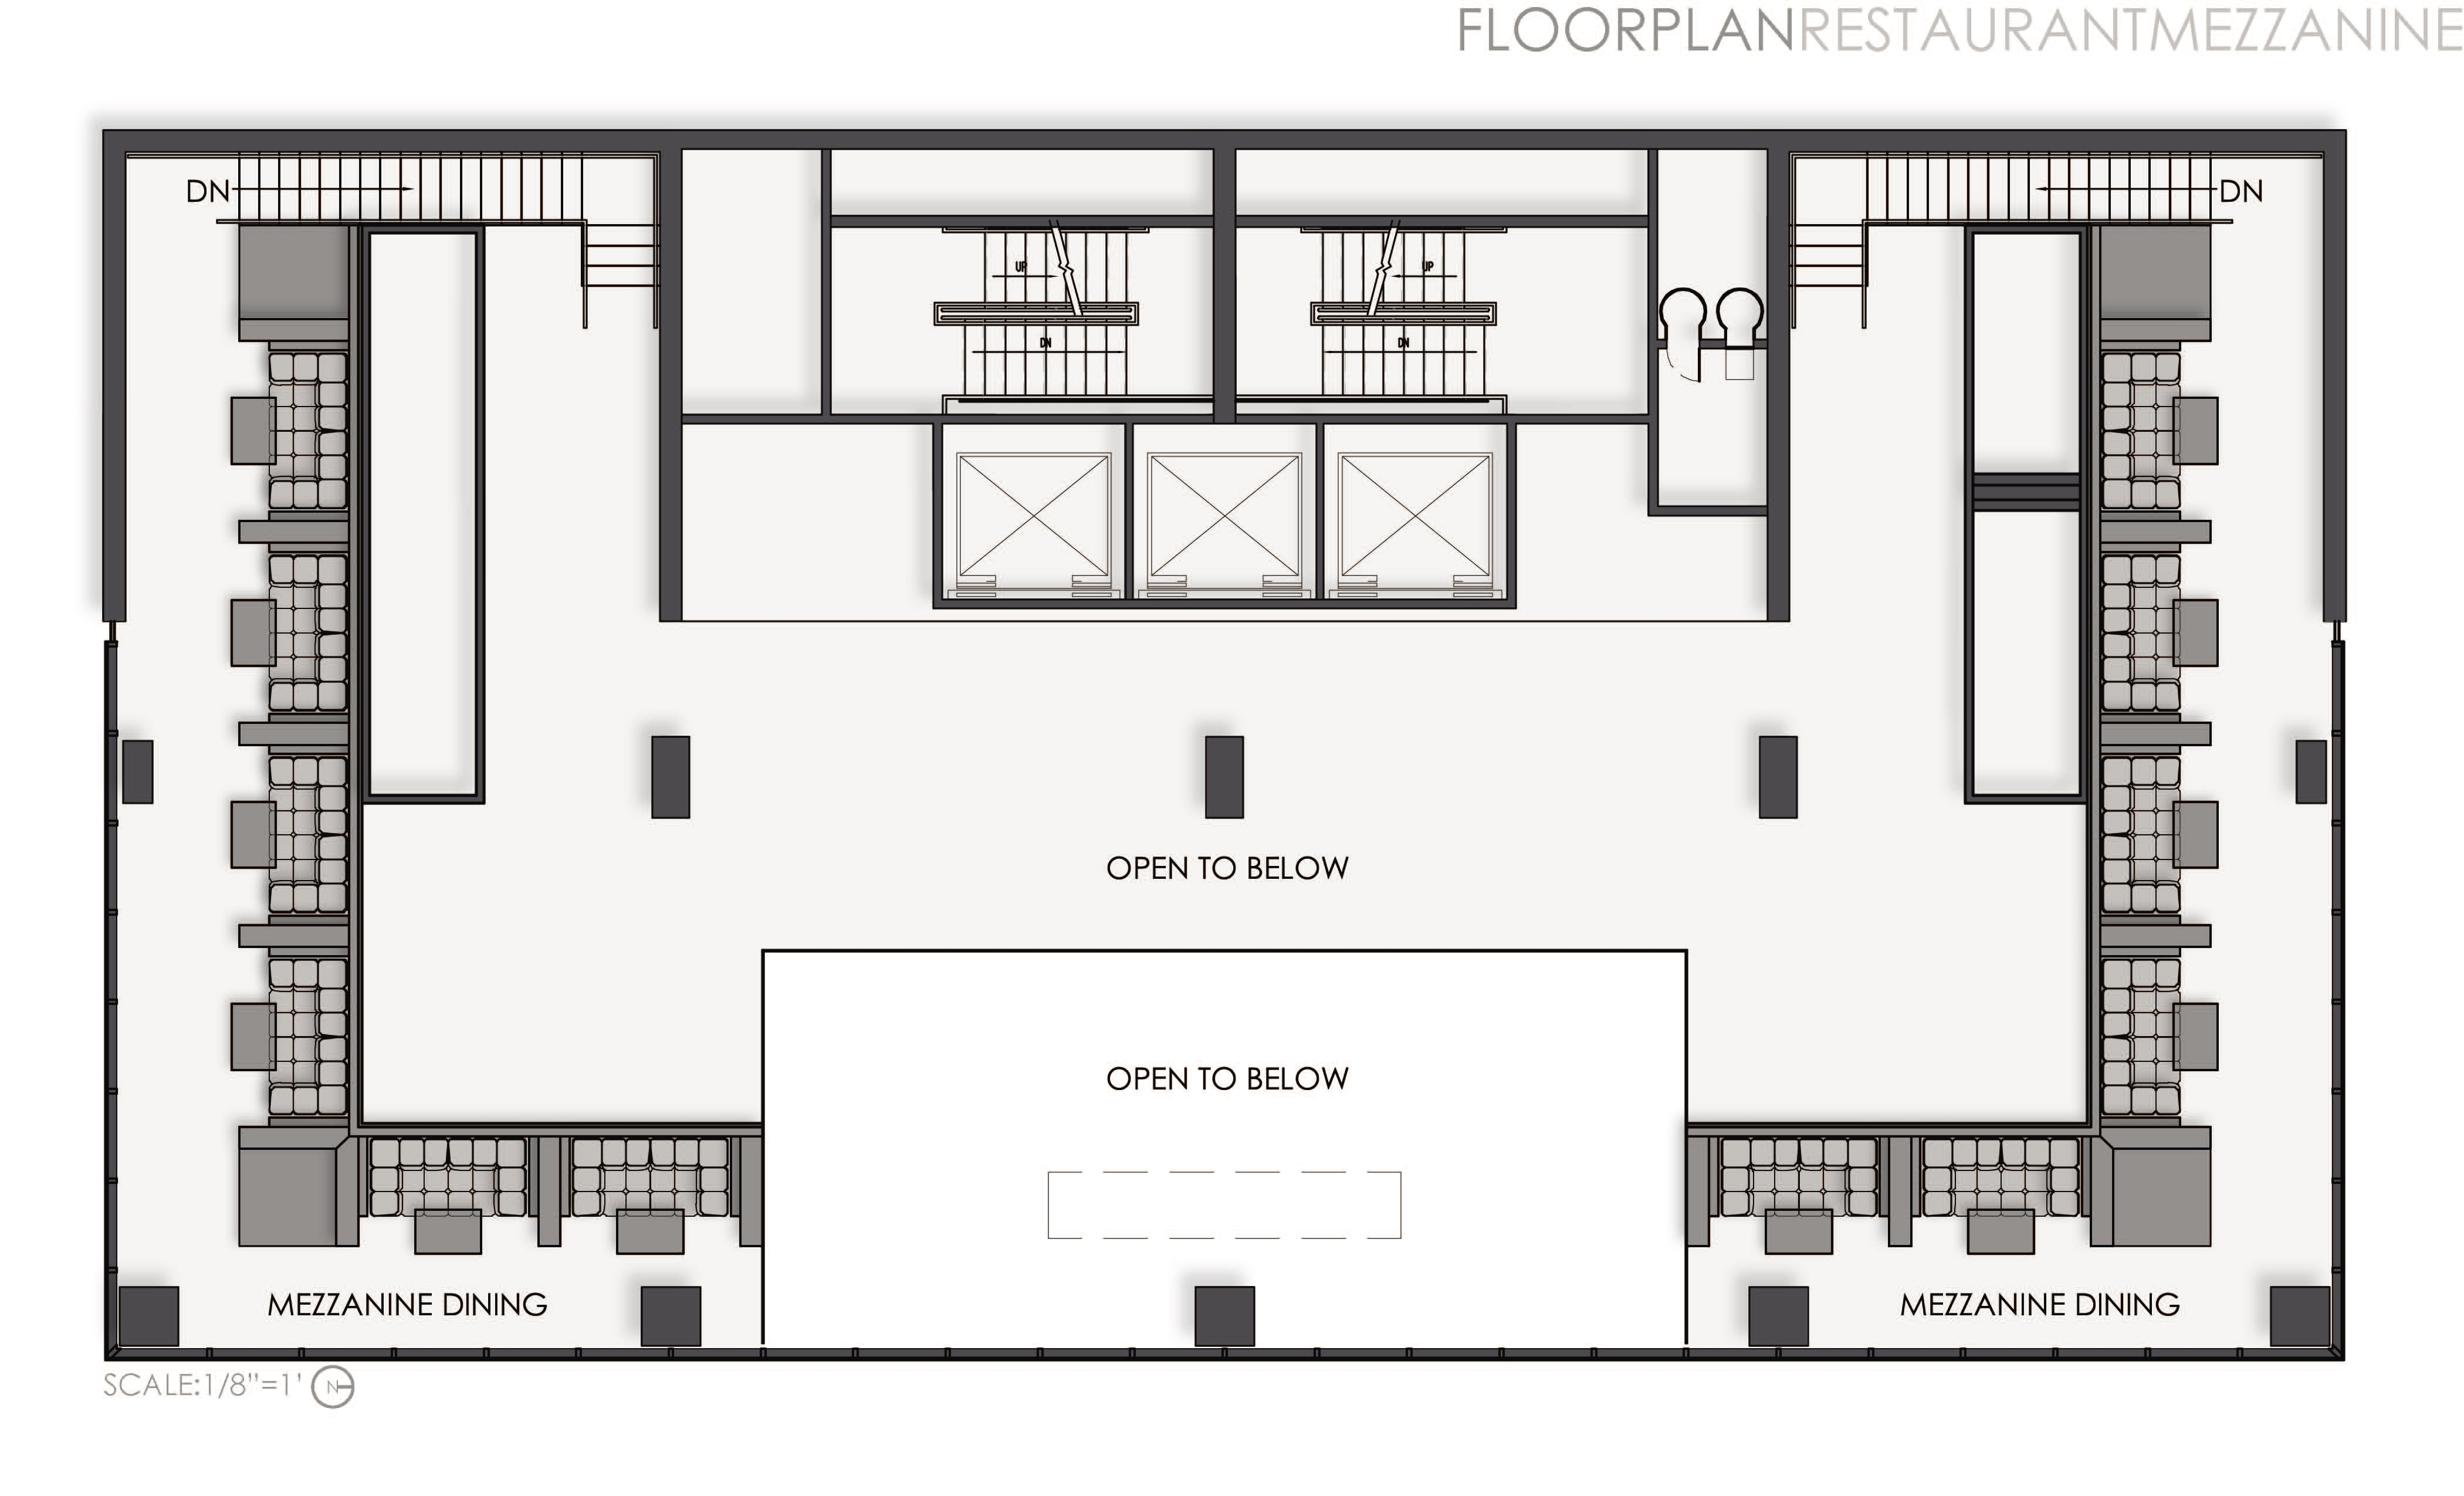 Interesting house with mezzanine floor plan images best for Mezzanine floor plans